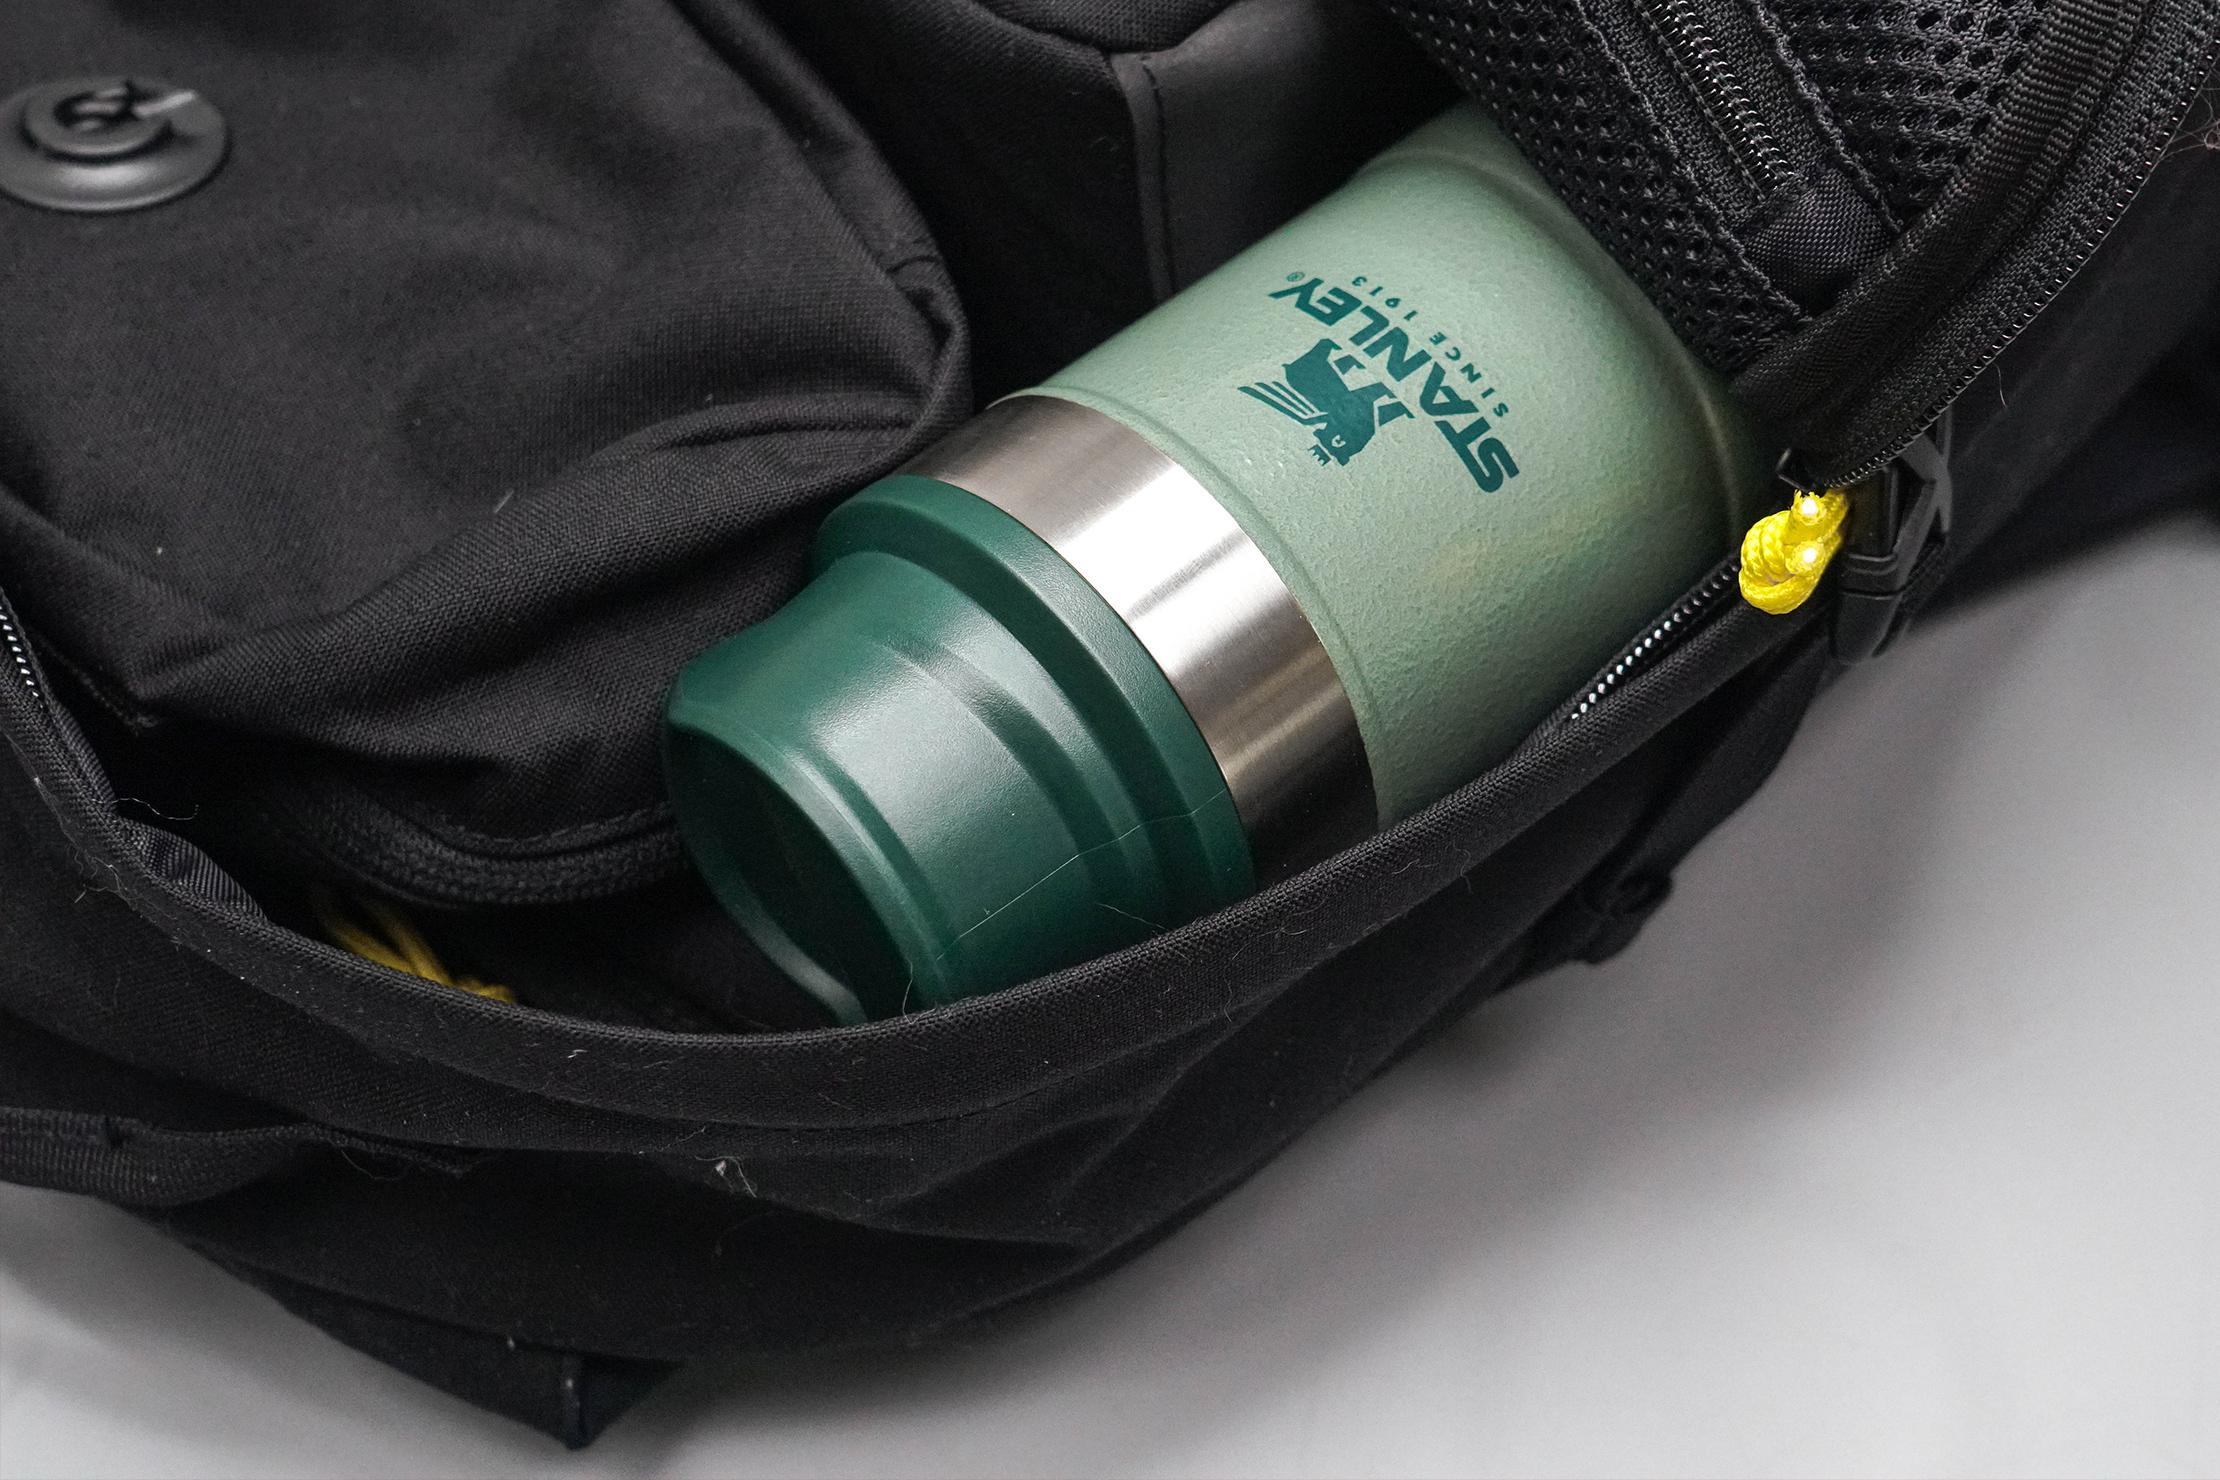 Stanley Classic Trigger-Action Travel Mug 12oz in Backpack